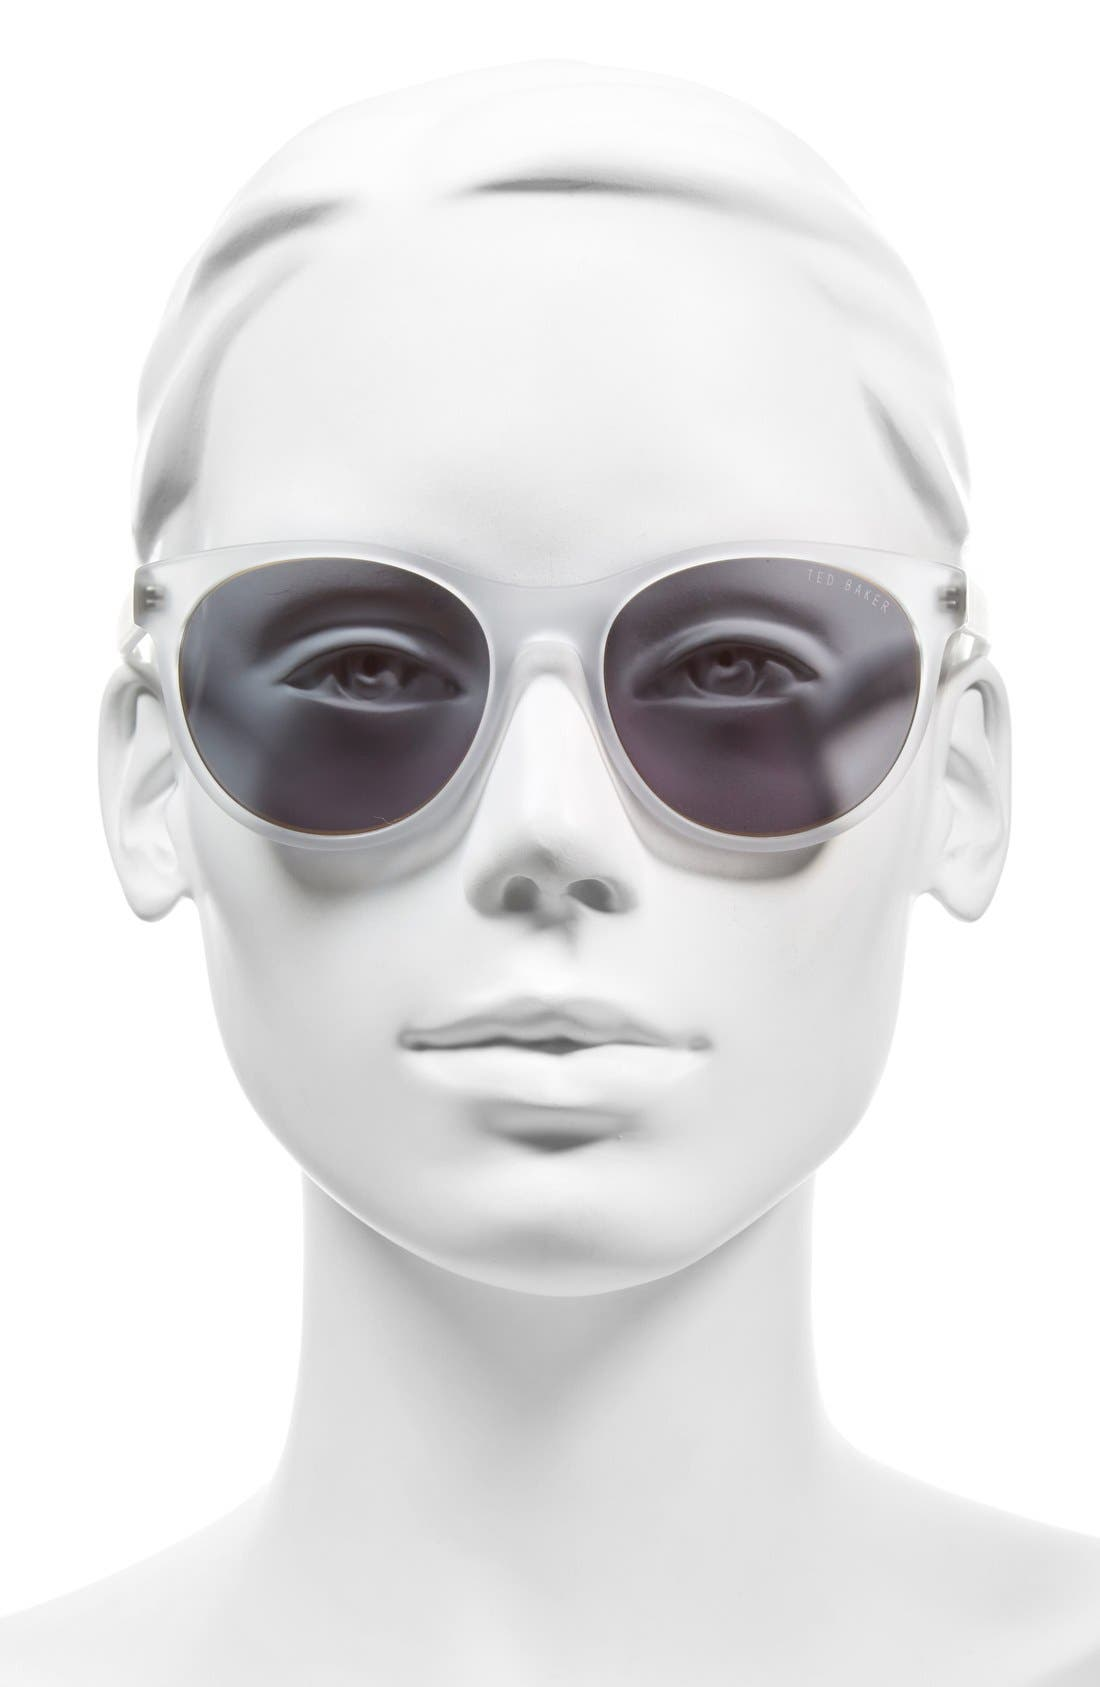 54mm Retro Sunglasses,                             Alternate thumbnail 7, color,